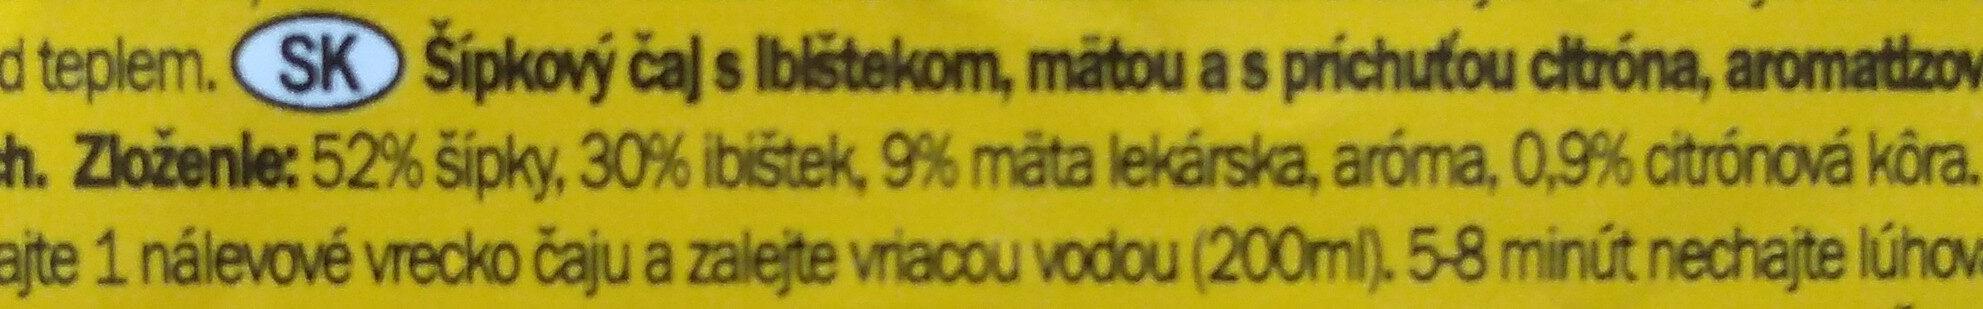 Roseship Lemon & Mint - Ingredients - sk